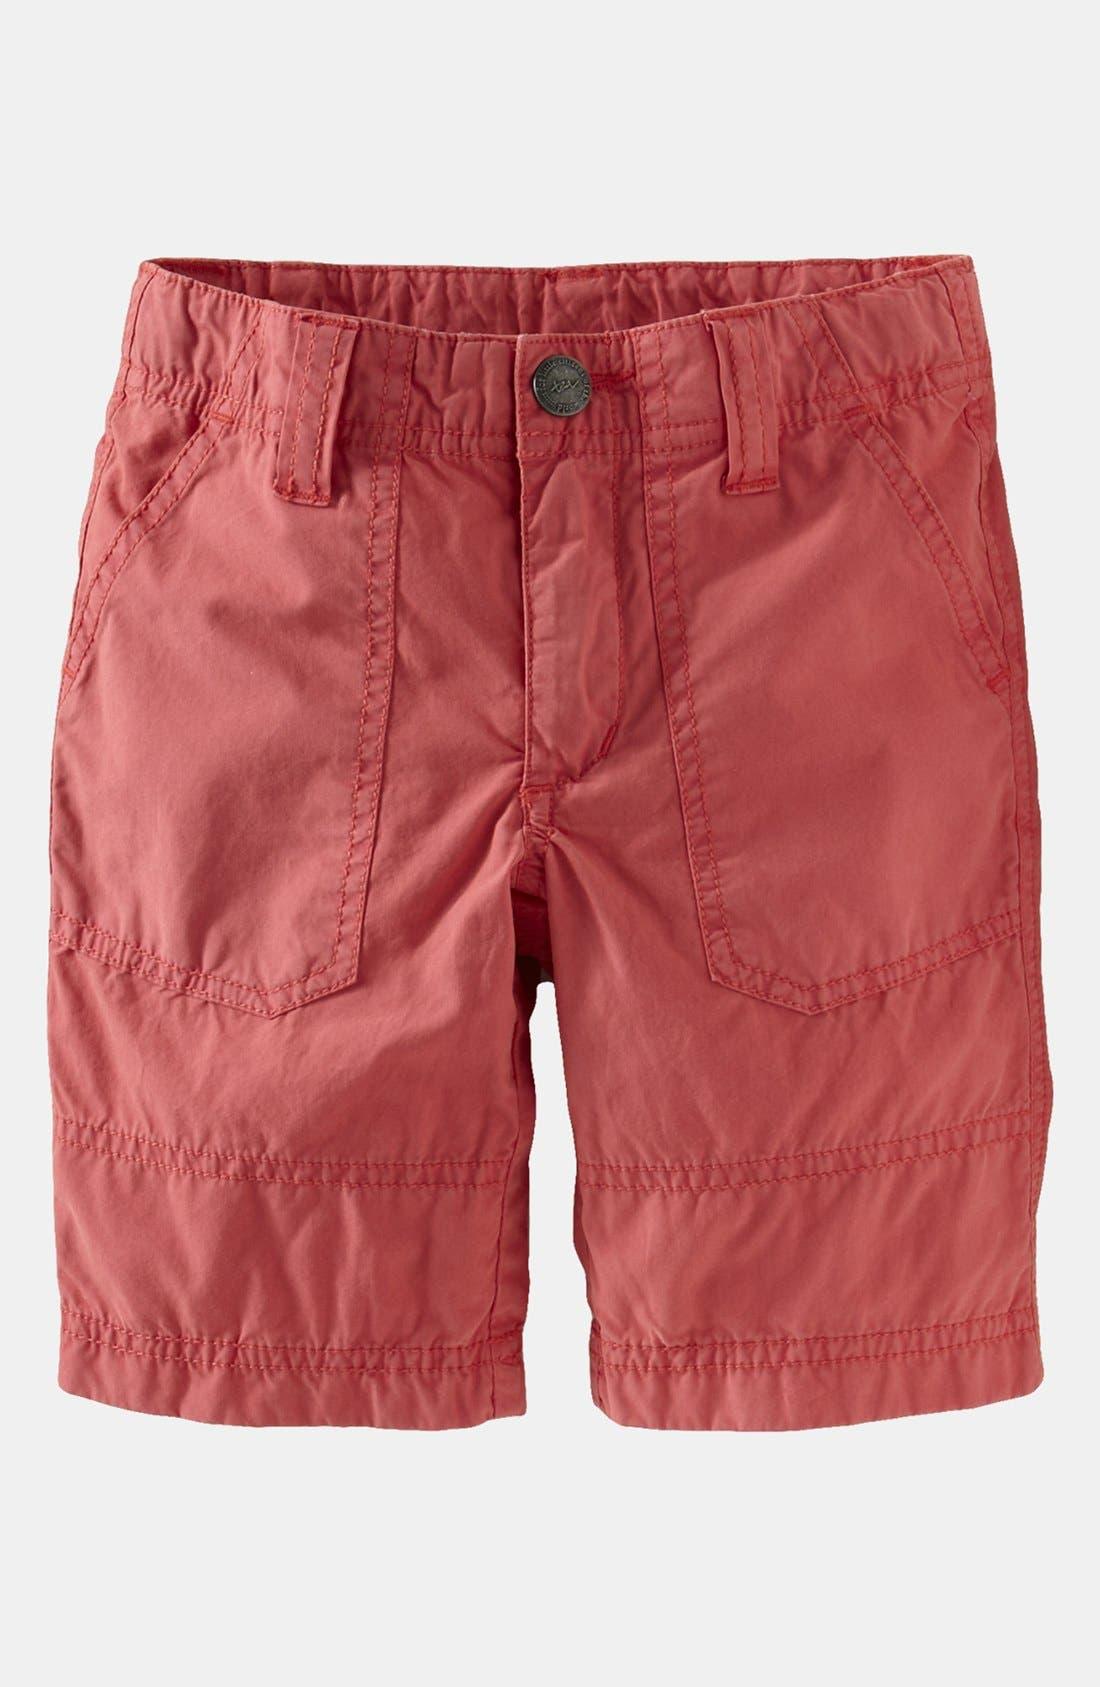 Main Image - Tea Collection 'Beach' Shorts (Toddler)